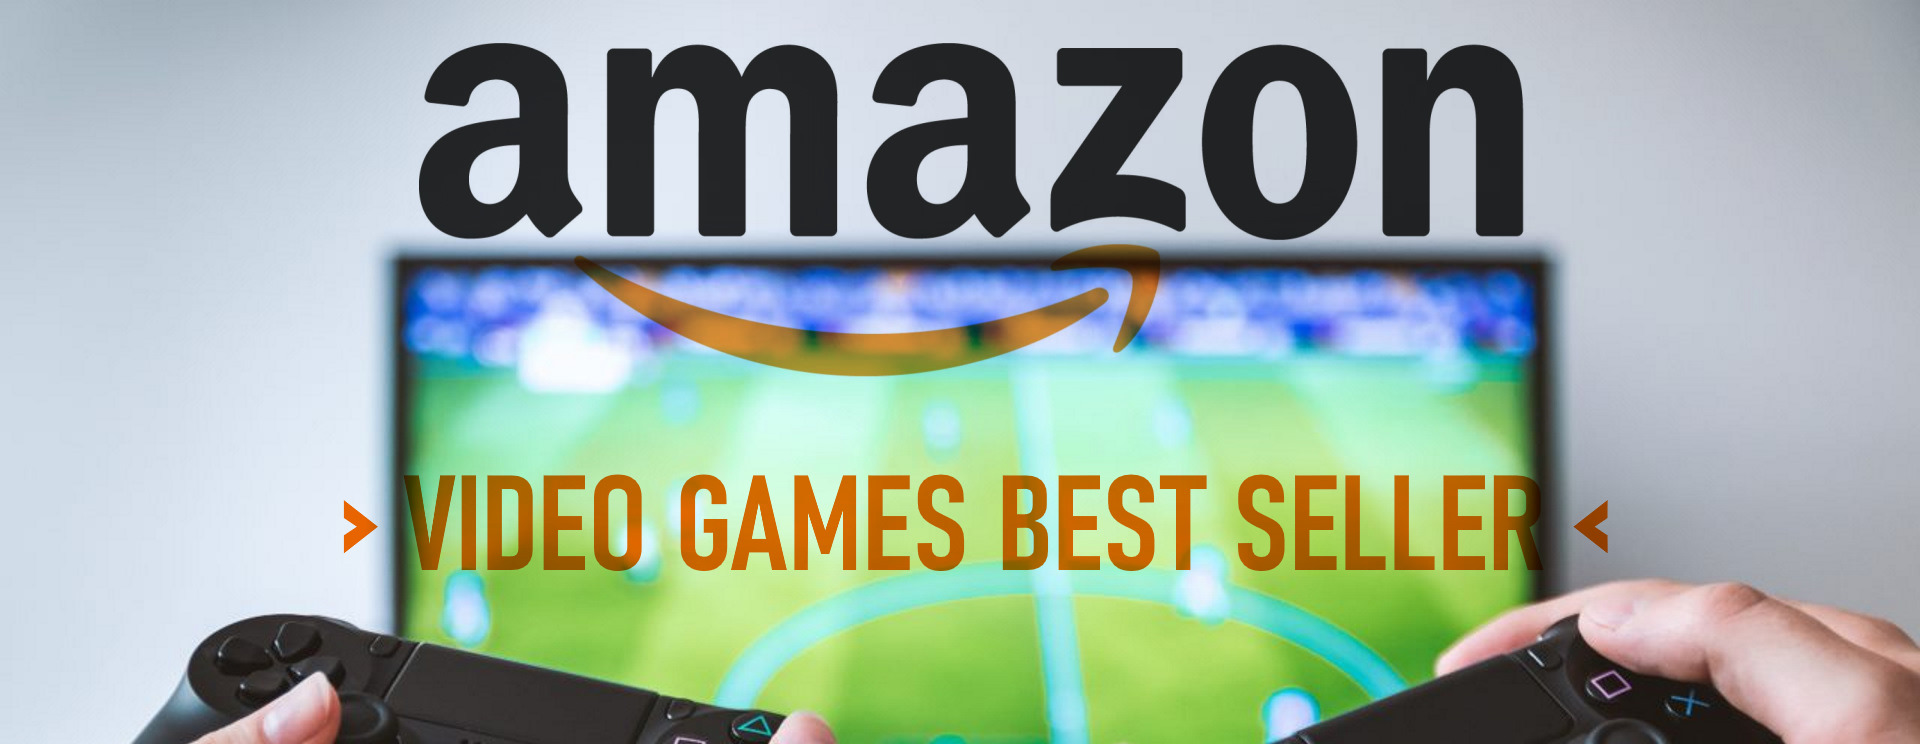 AMAZON - VIDEO GAMES BEST SELLER